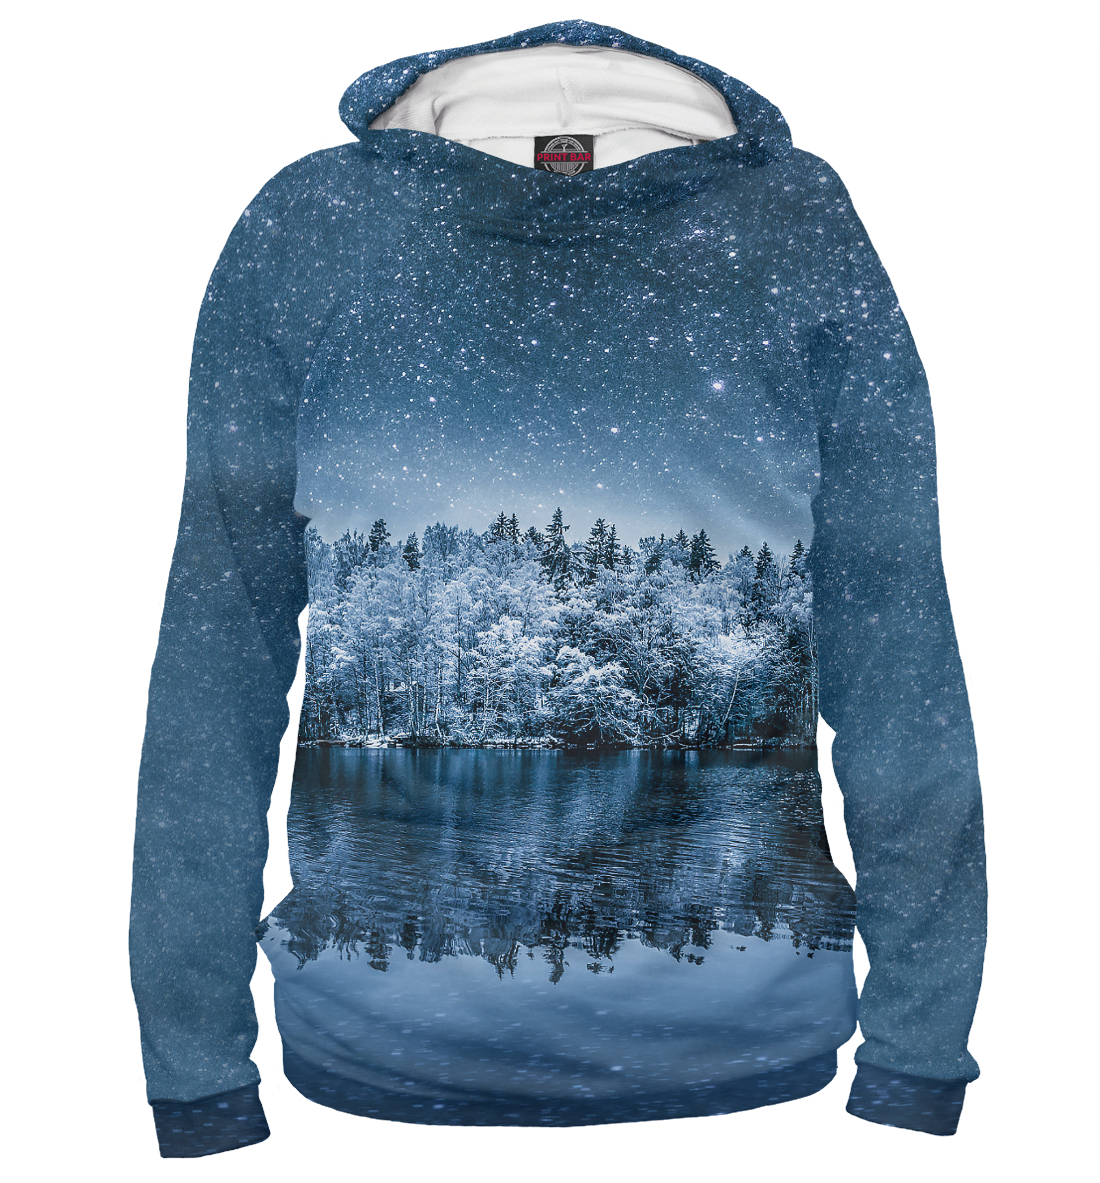 Starry winter